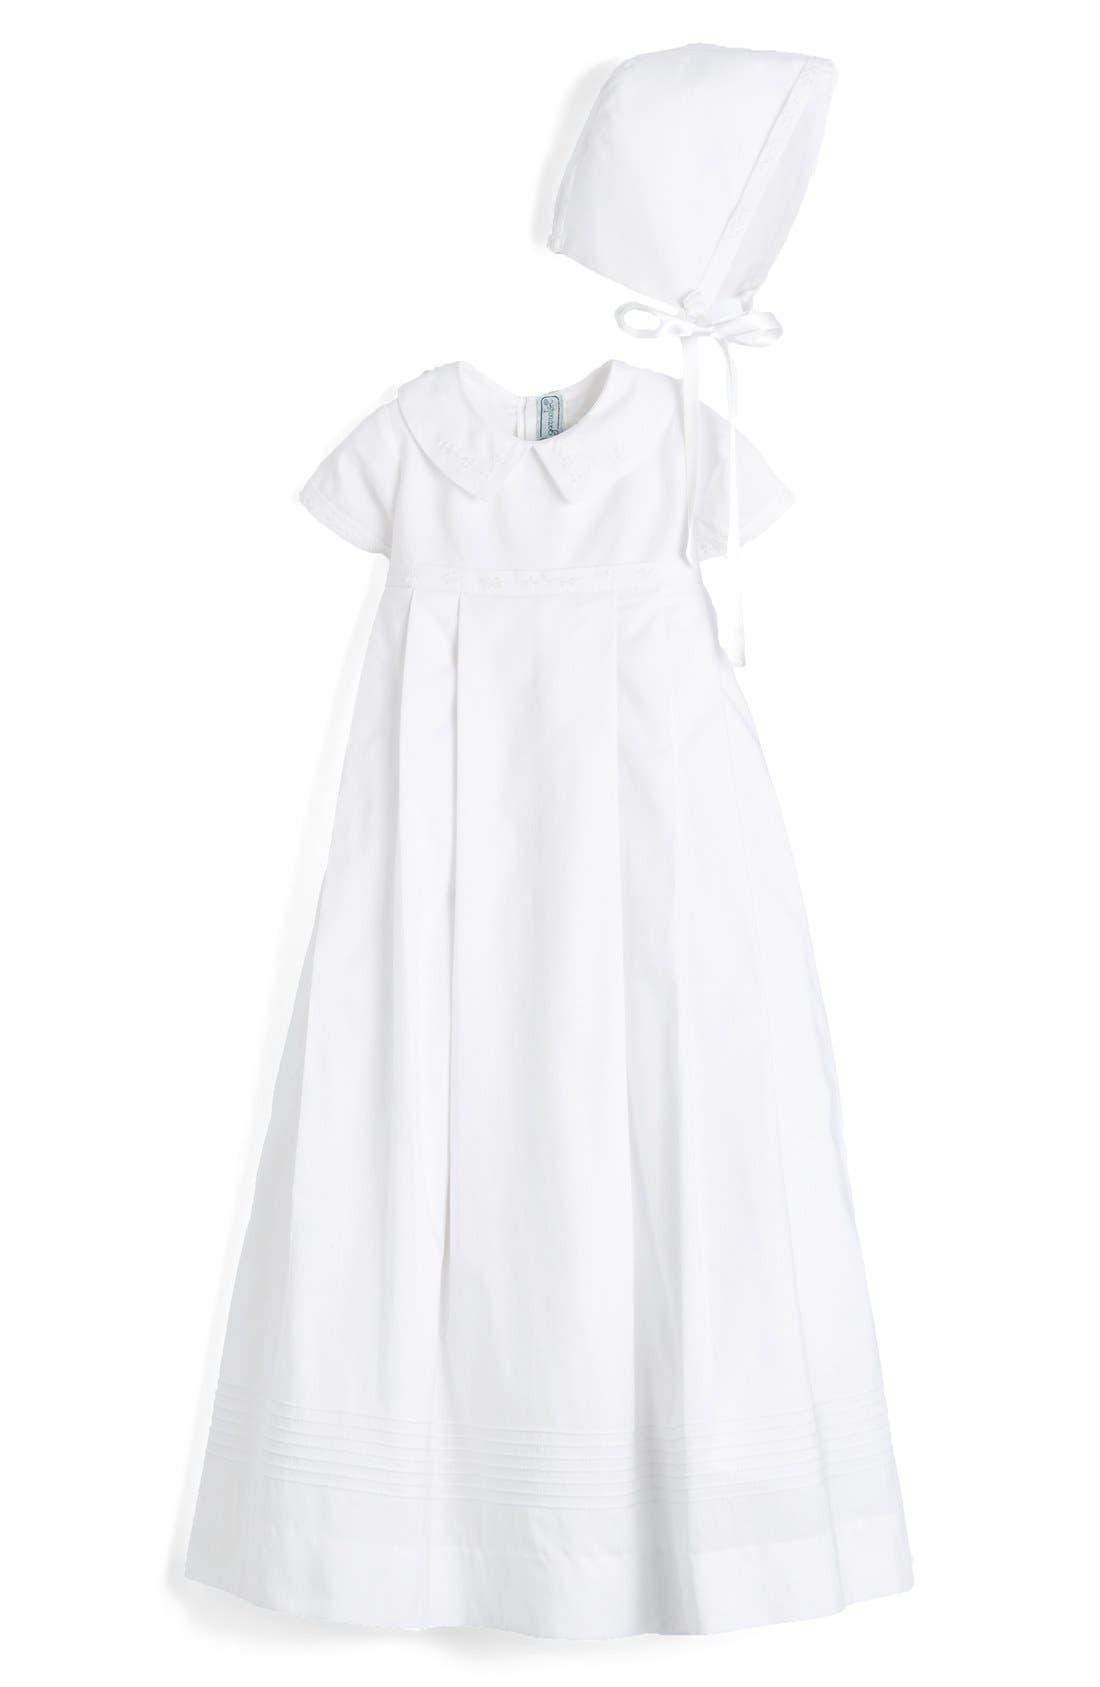 Alternate Image 1 Selected - Isabel Garreton 'Classic' Christening Gown & Bonnet (Baby)